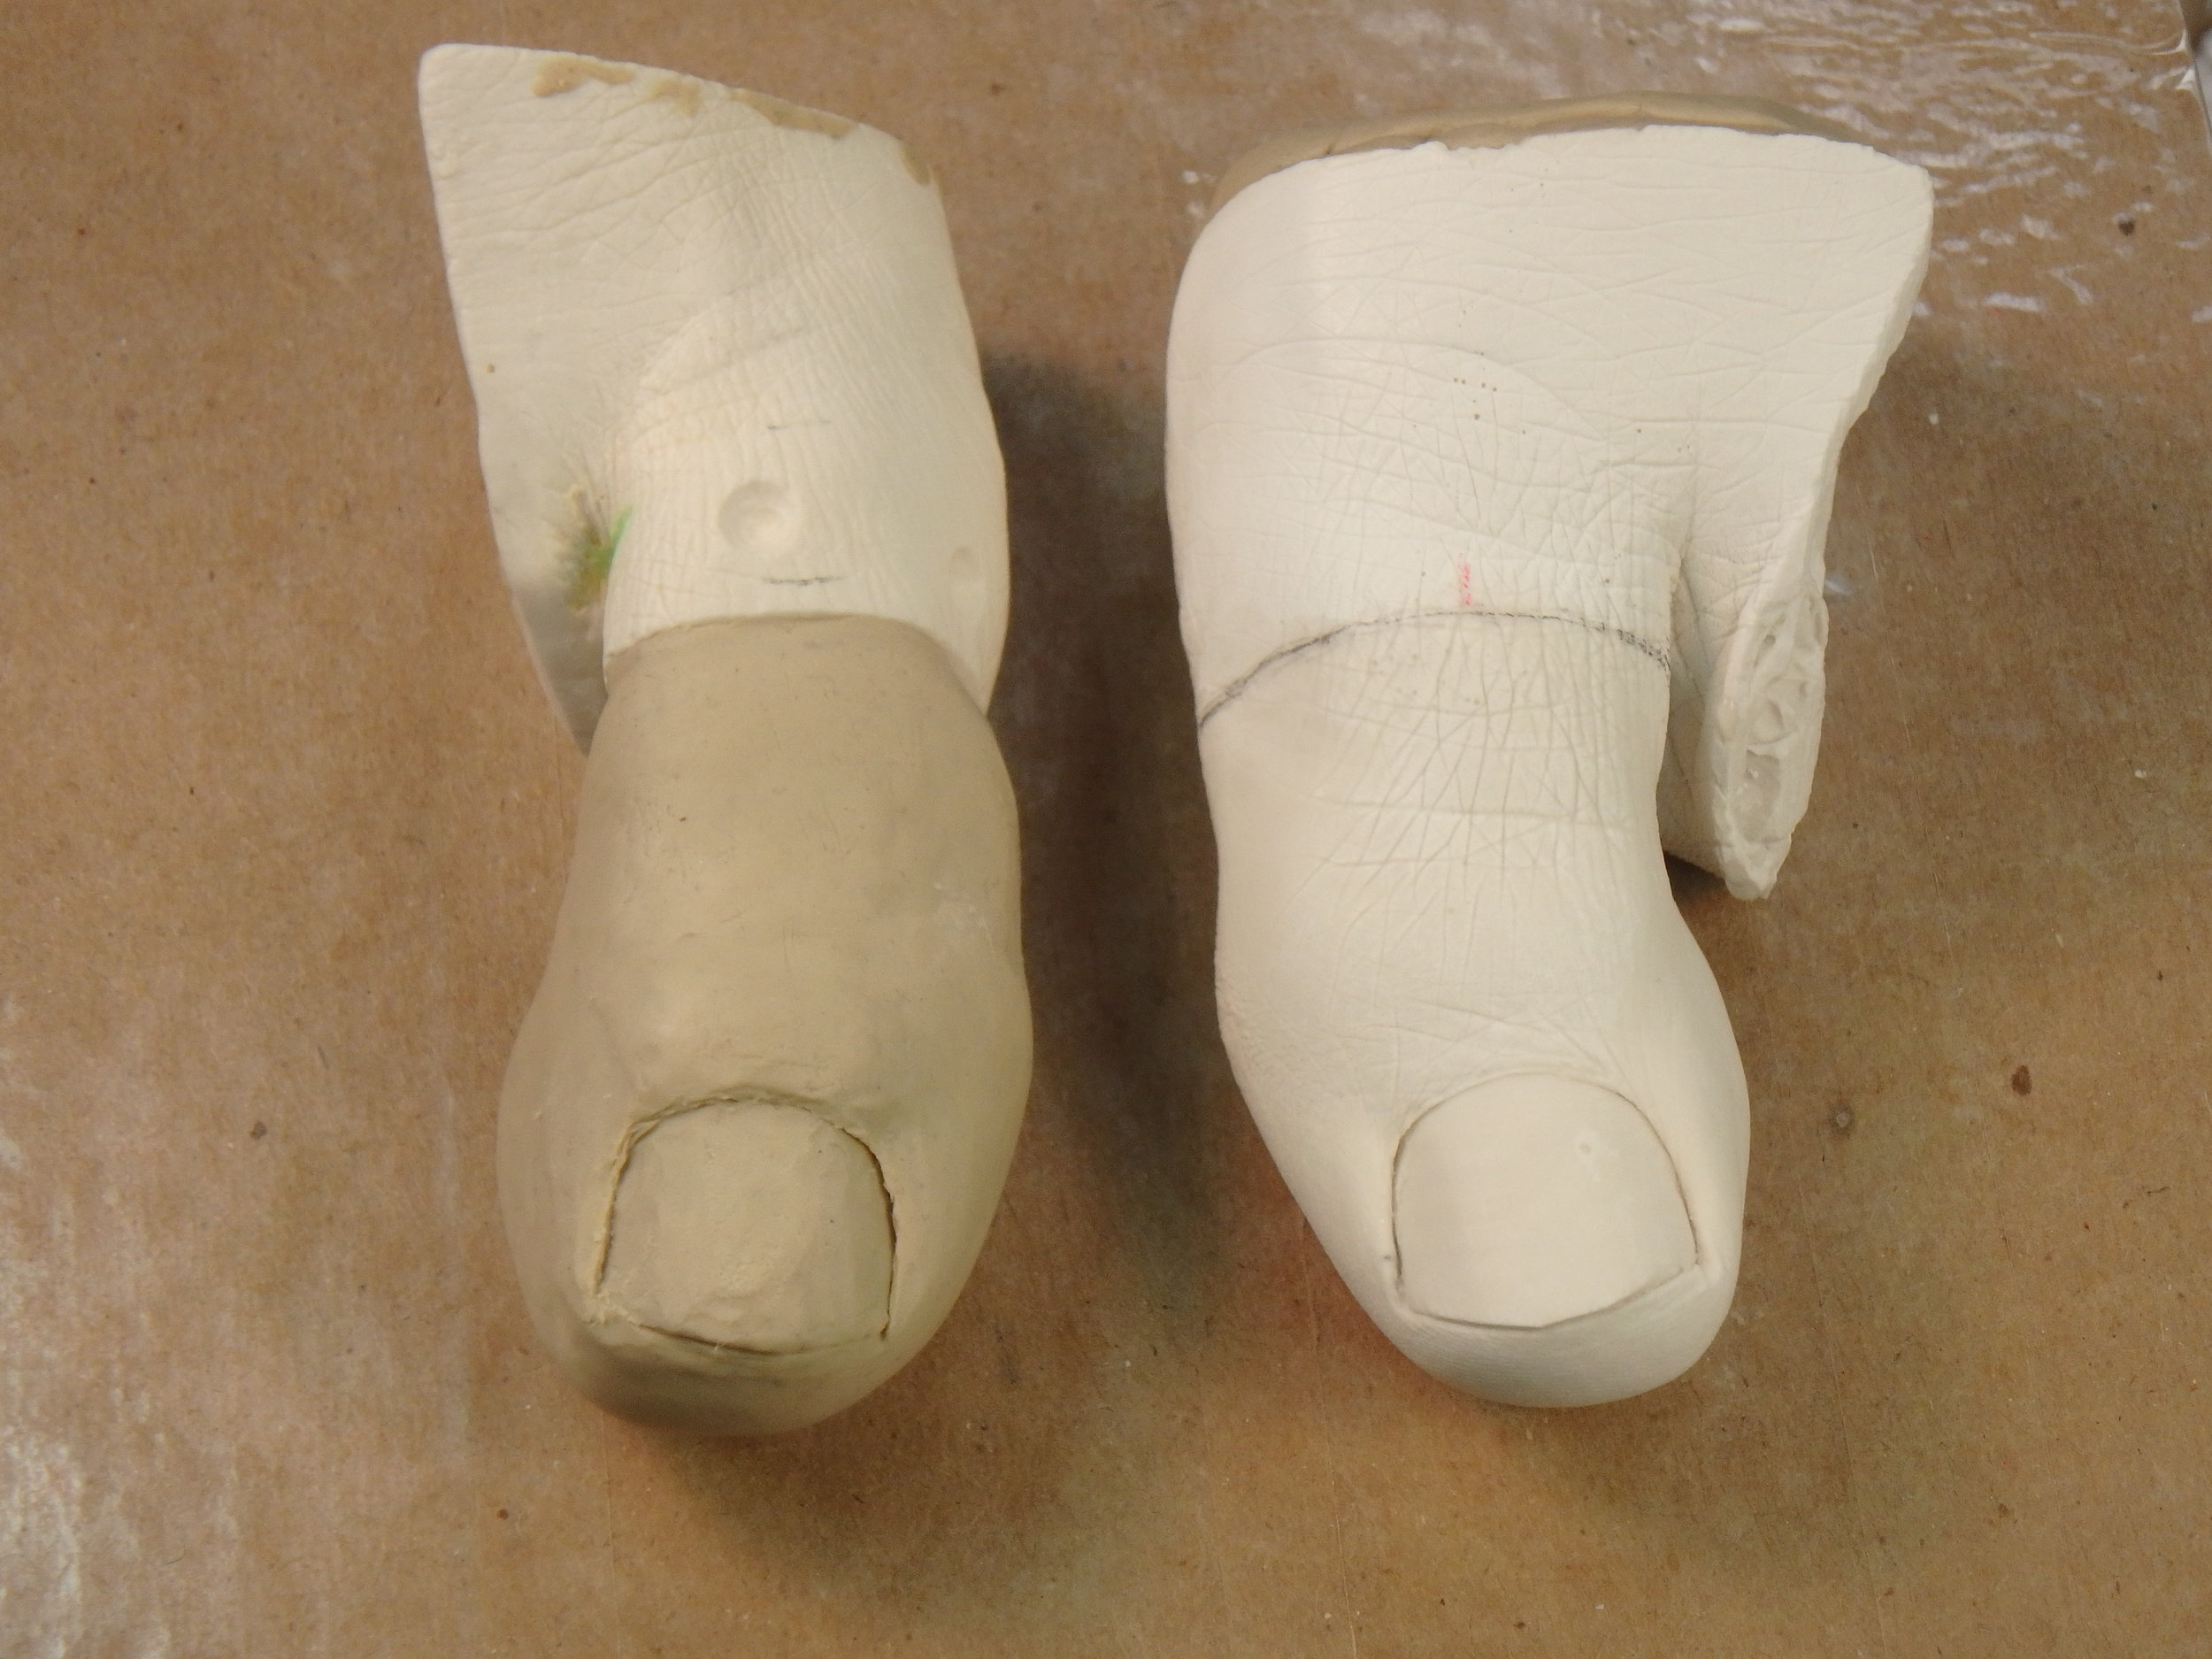 Big Toe Clay Modeling